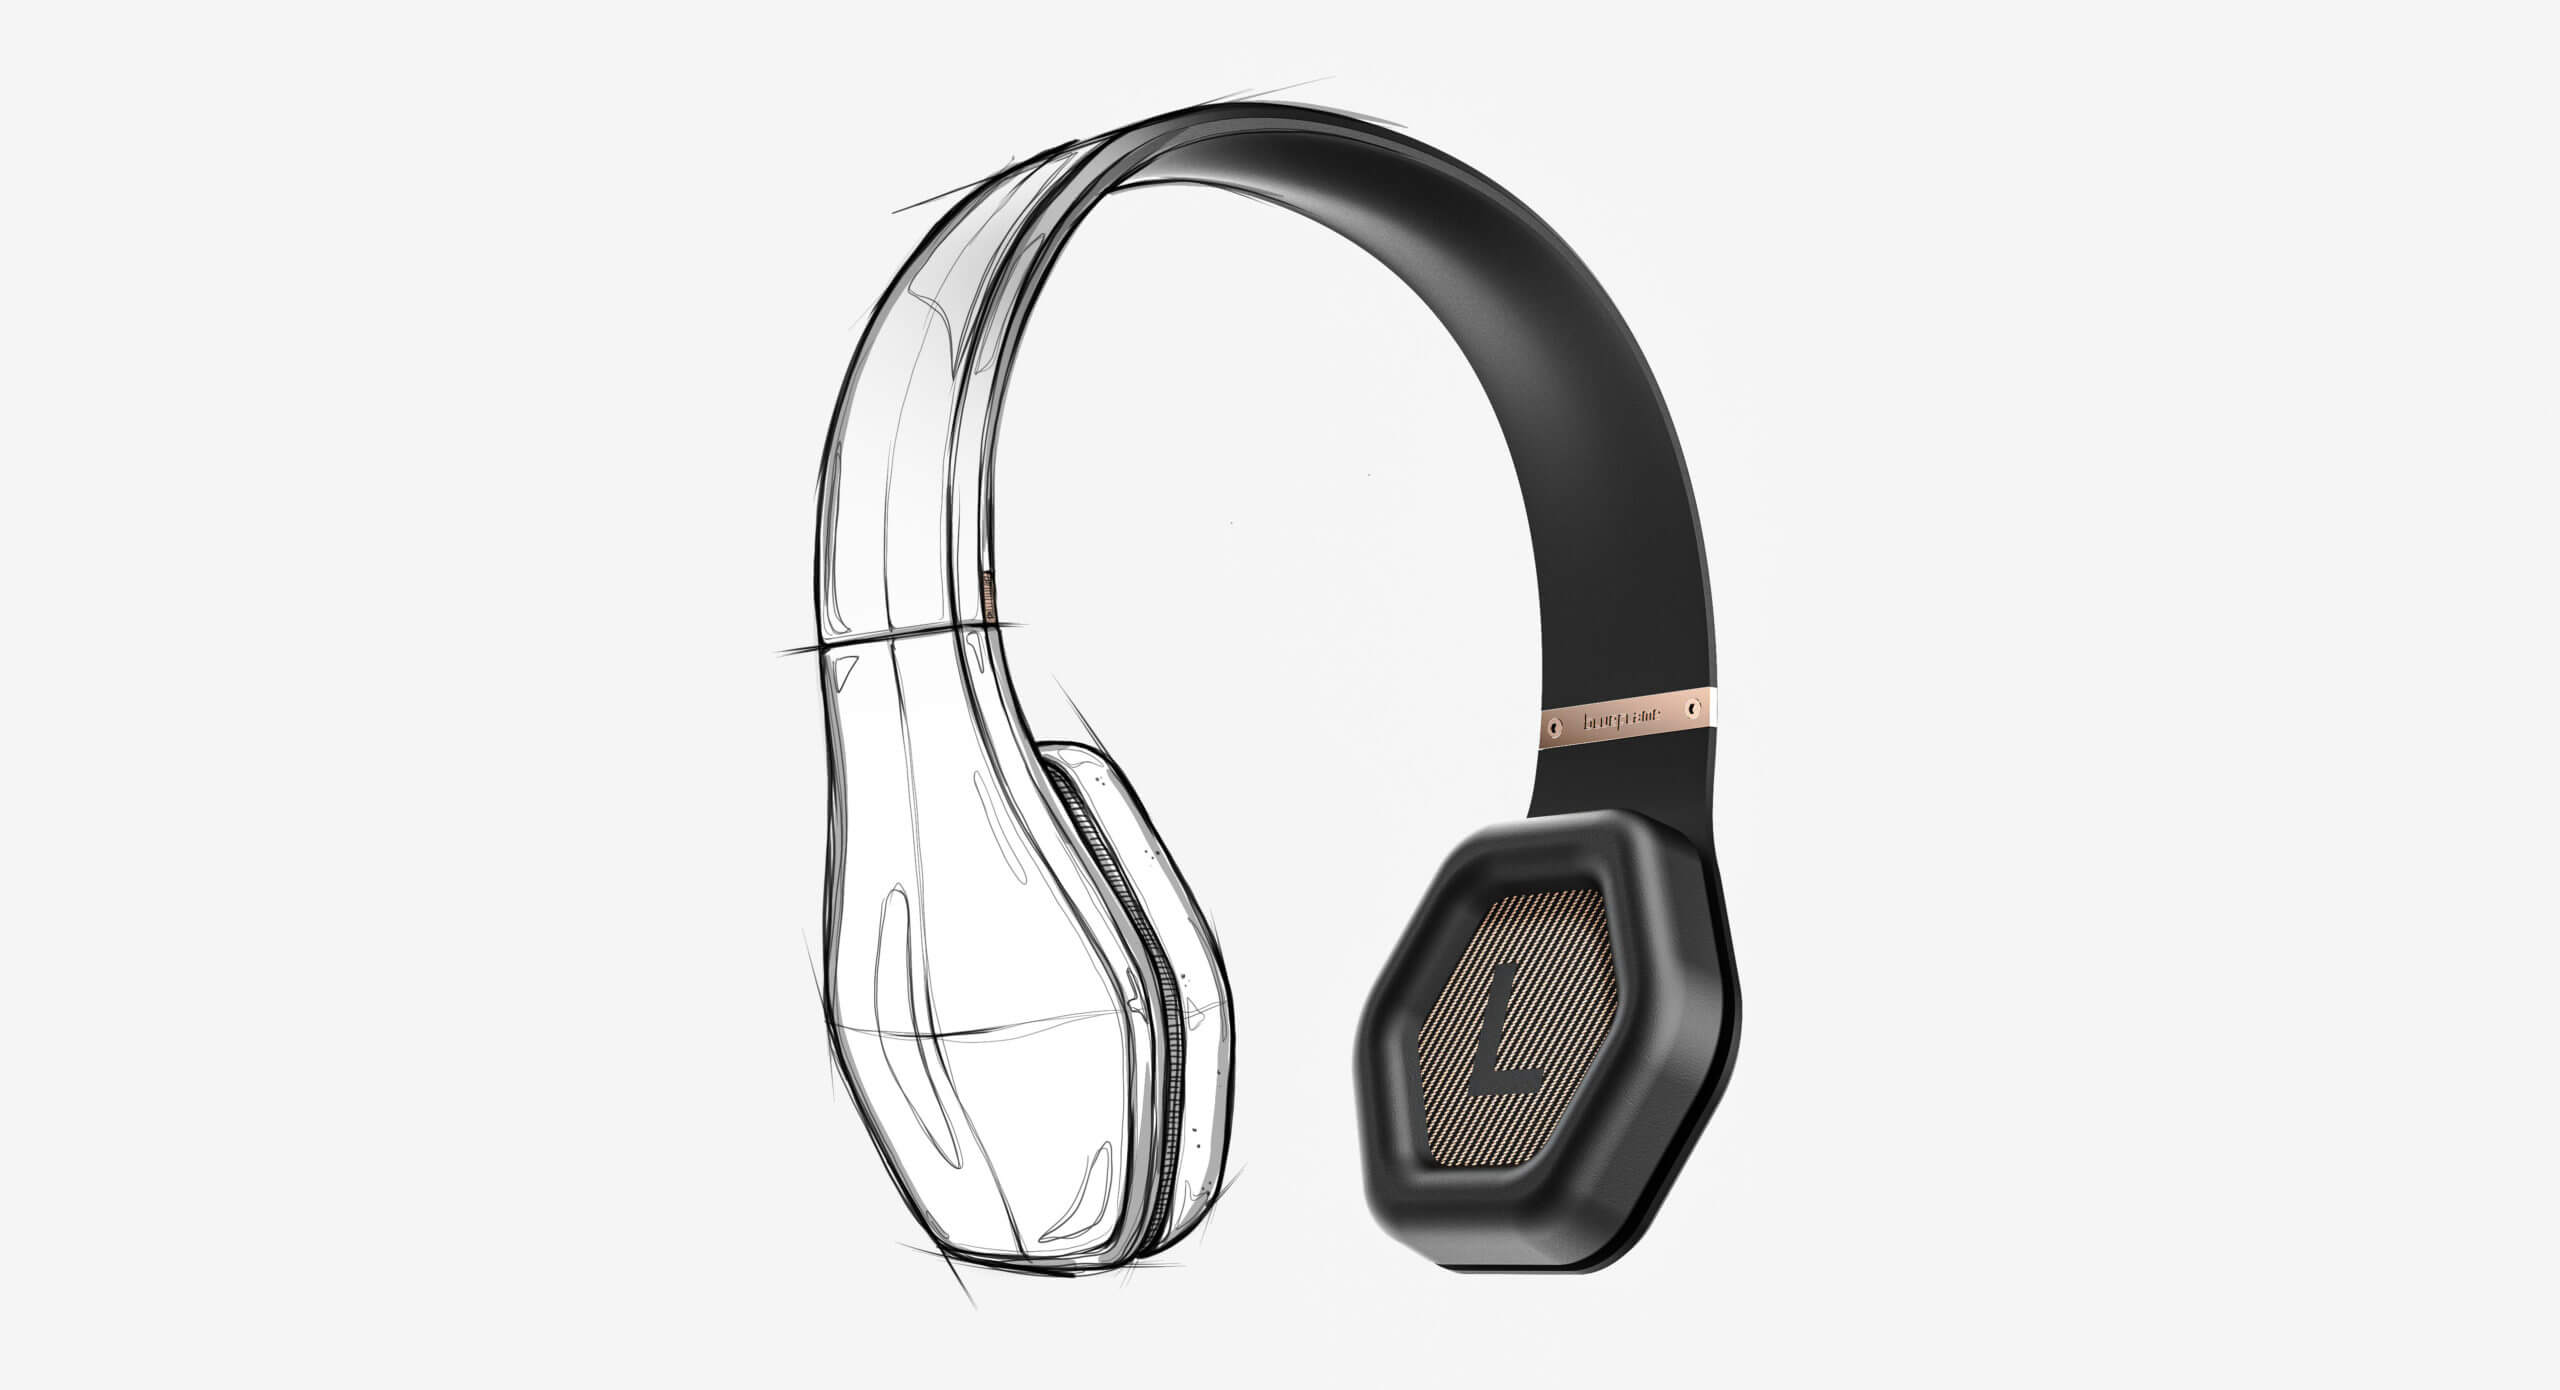 Blueflame headphones sketch to render